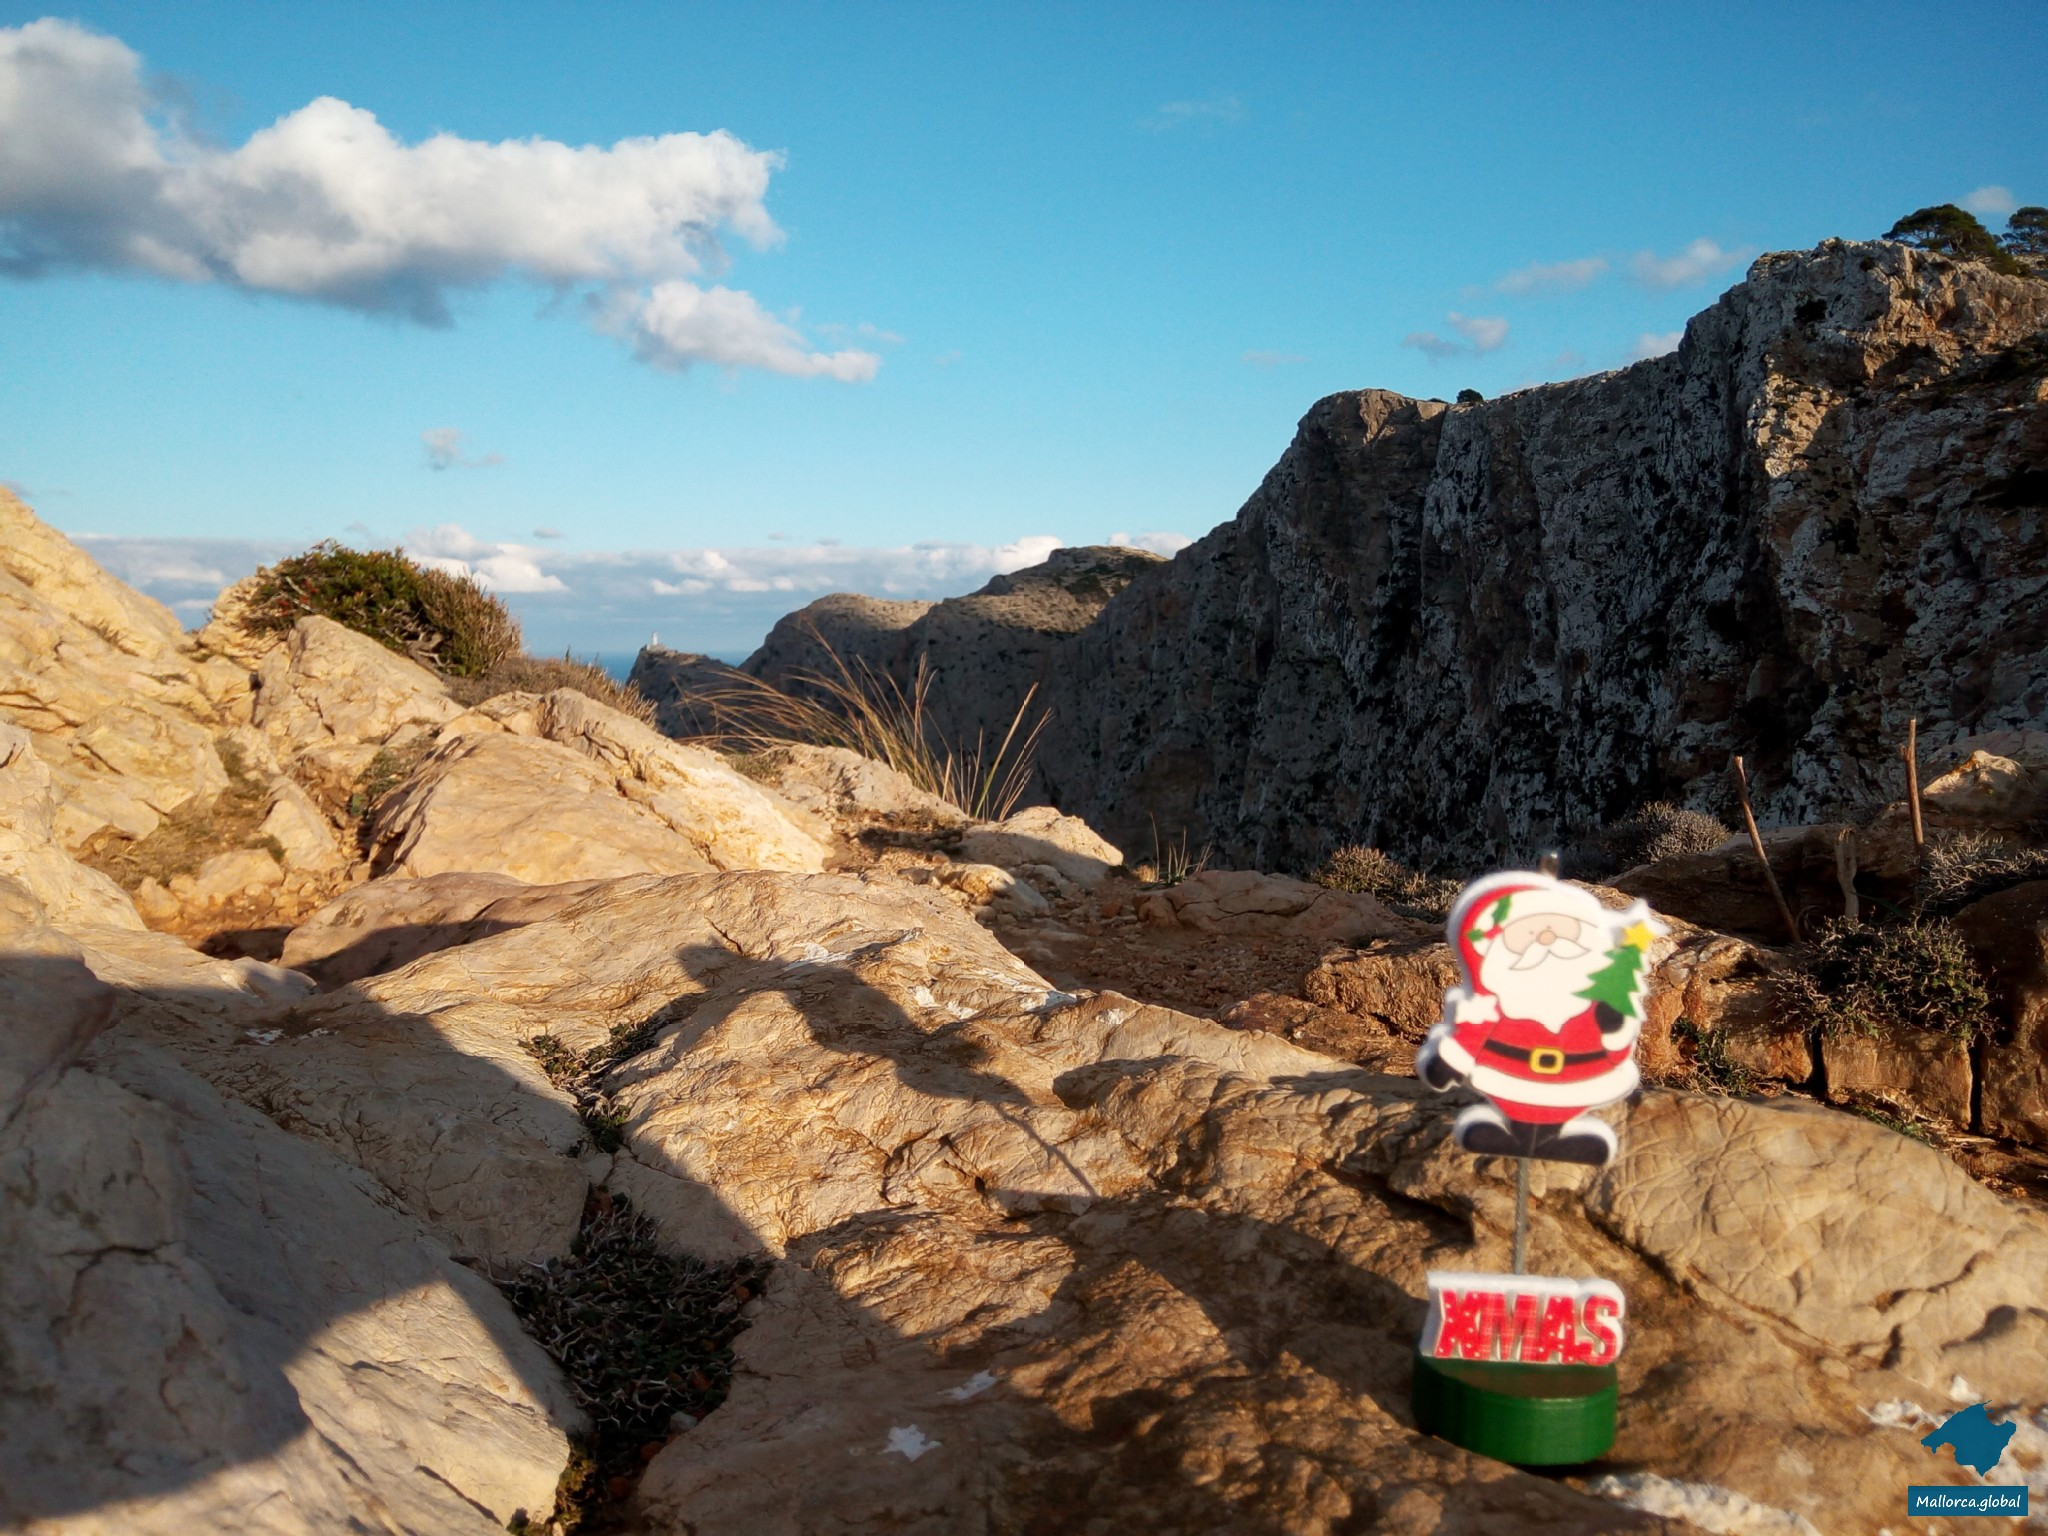 Weihnachtsgruß aus Mallorca